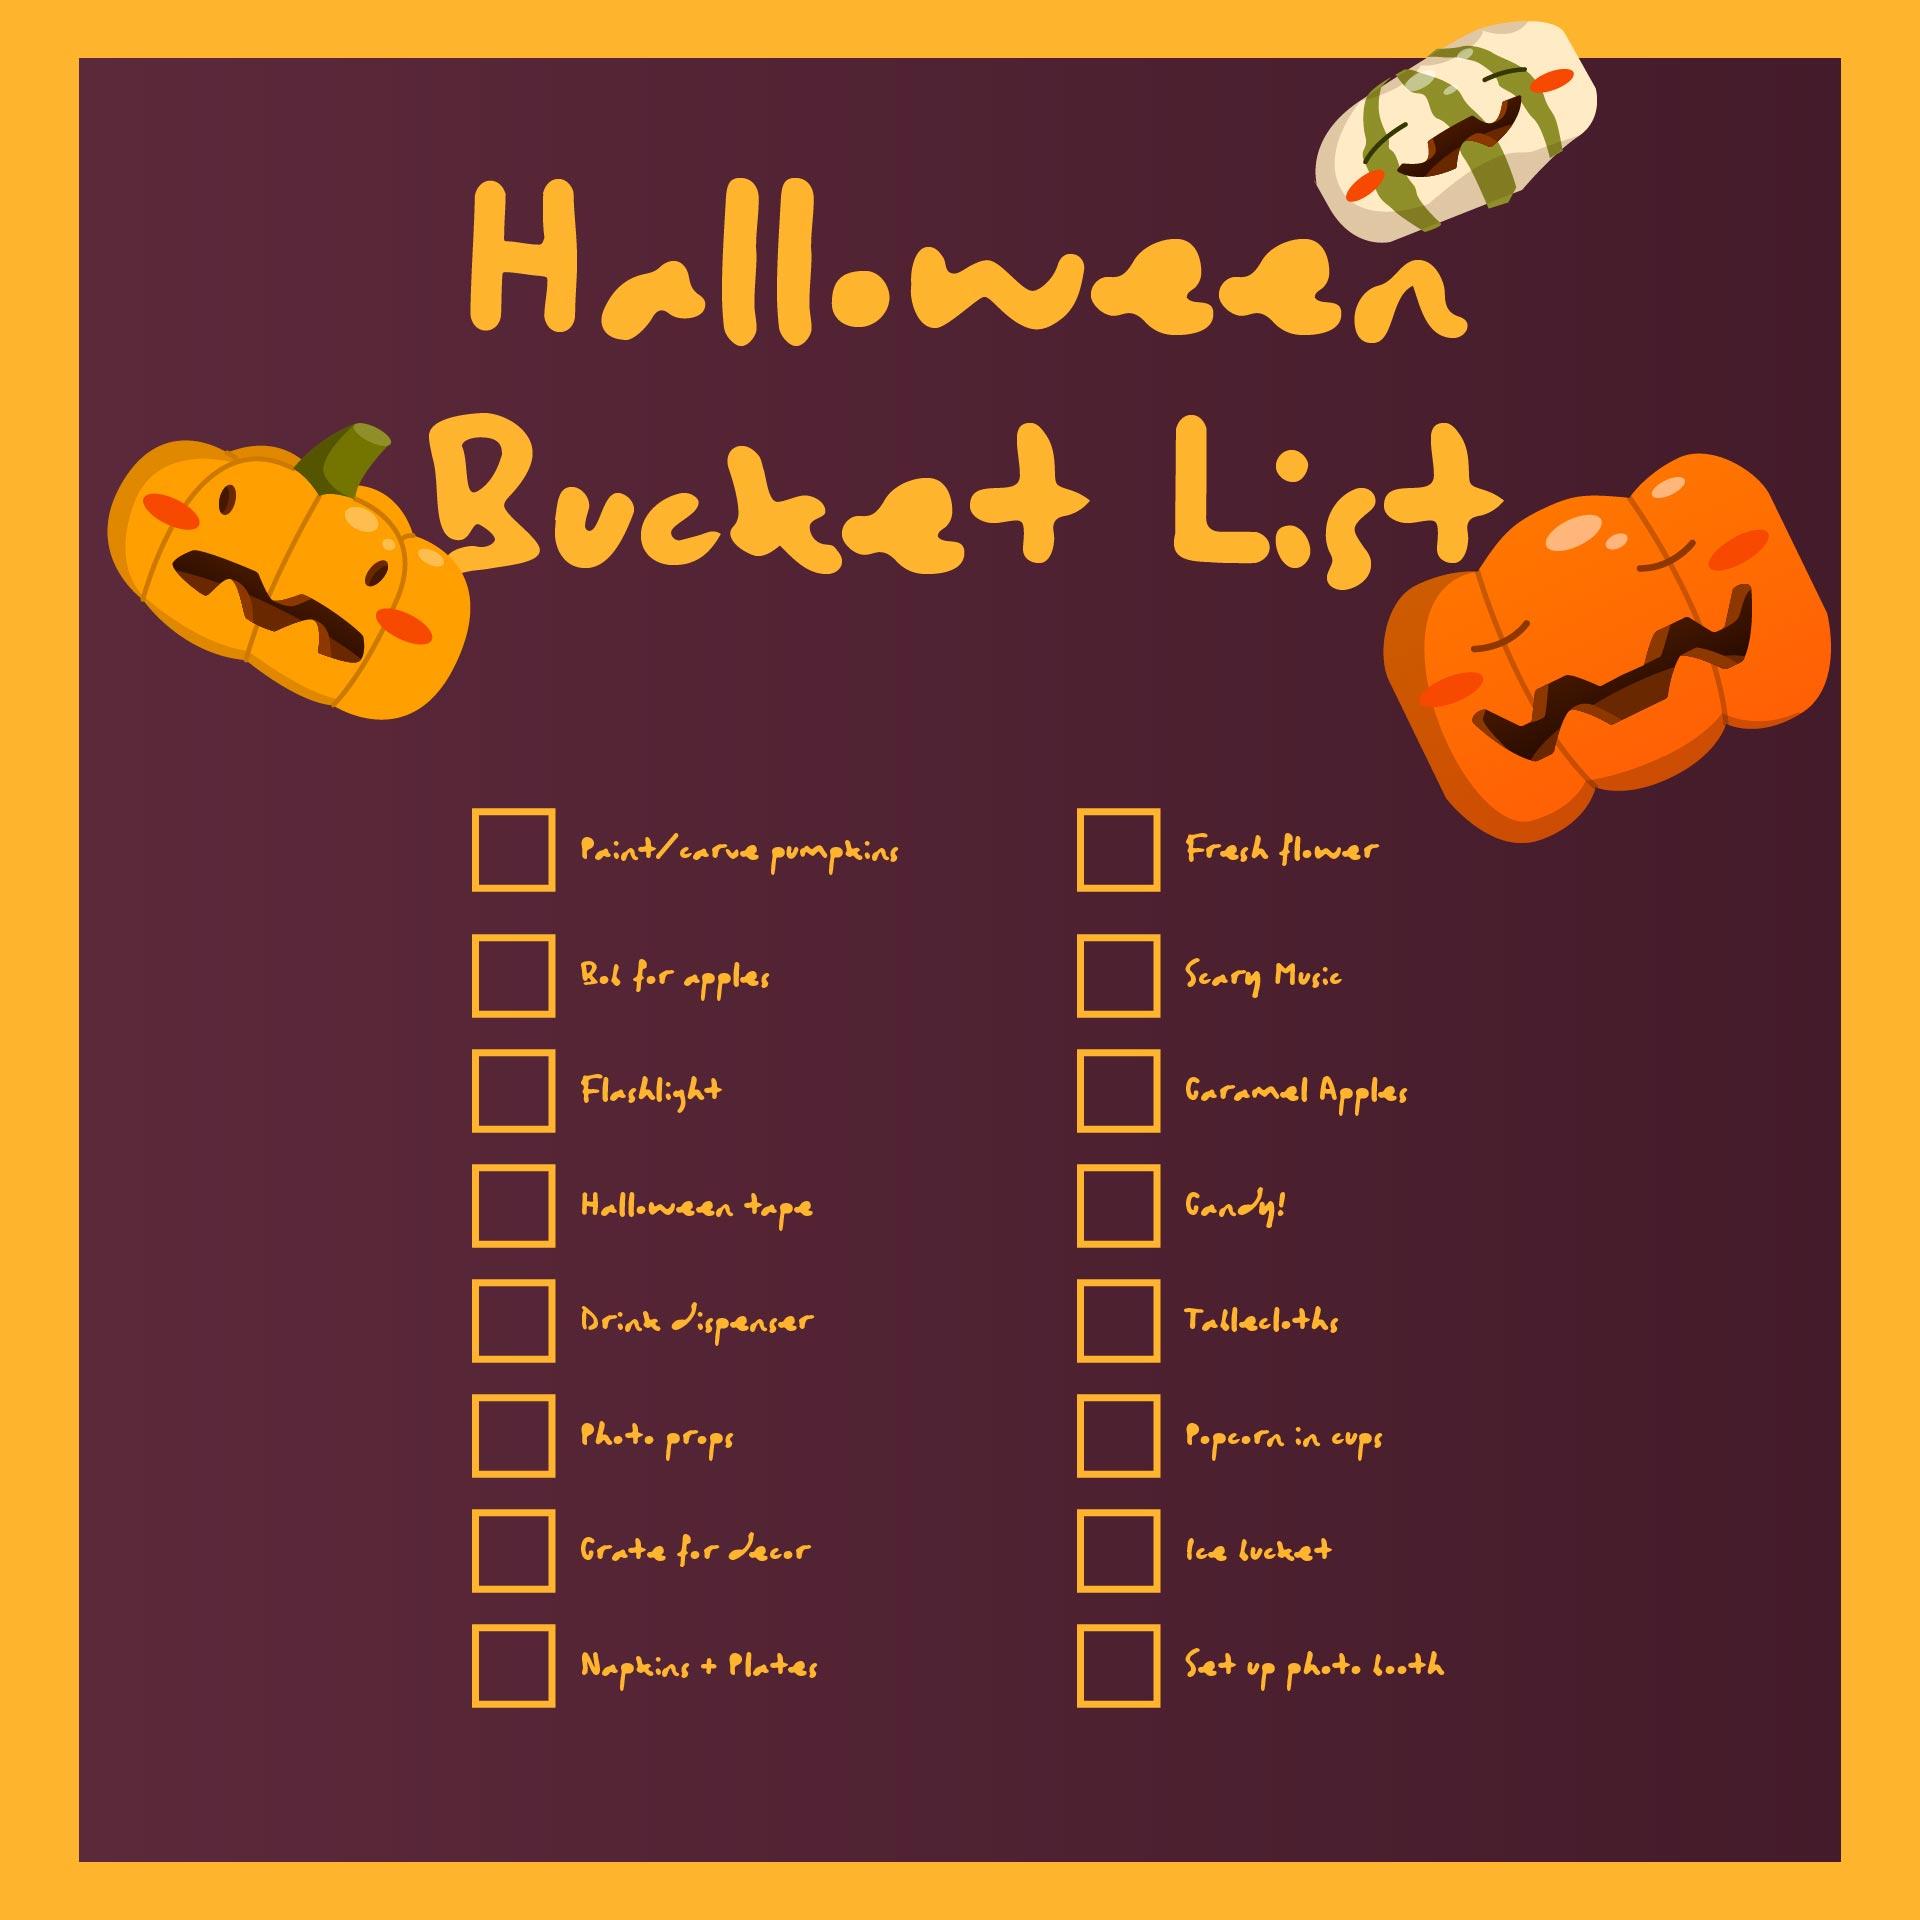 Spooky Halloween To Do List Free Printable